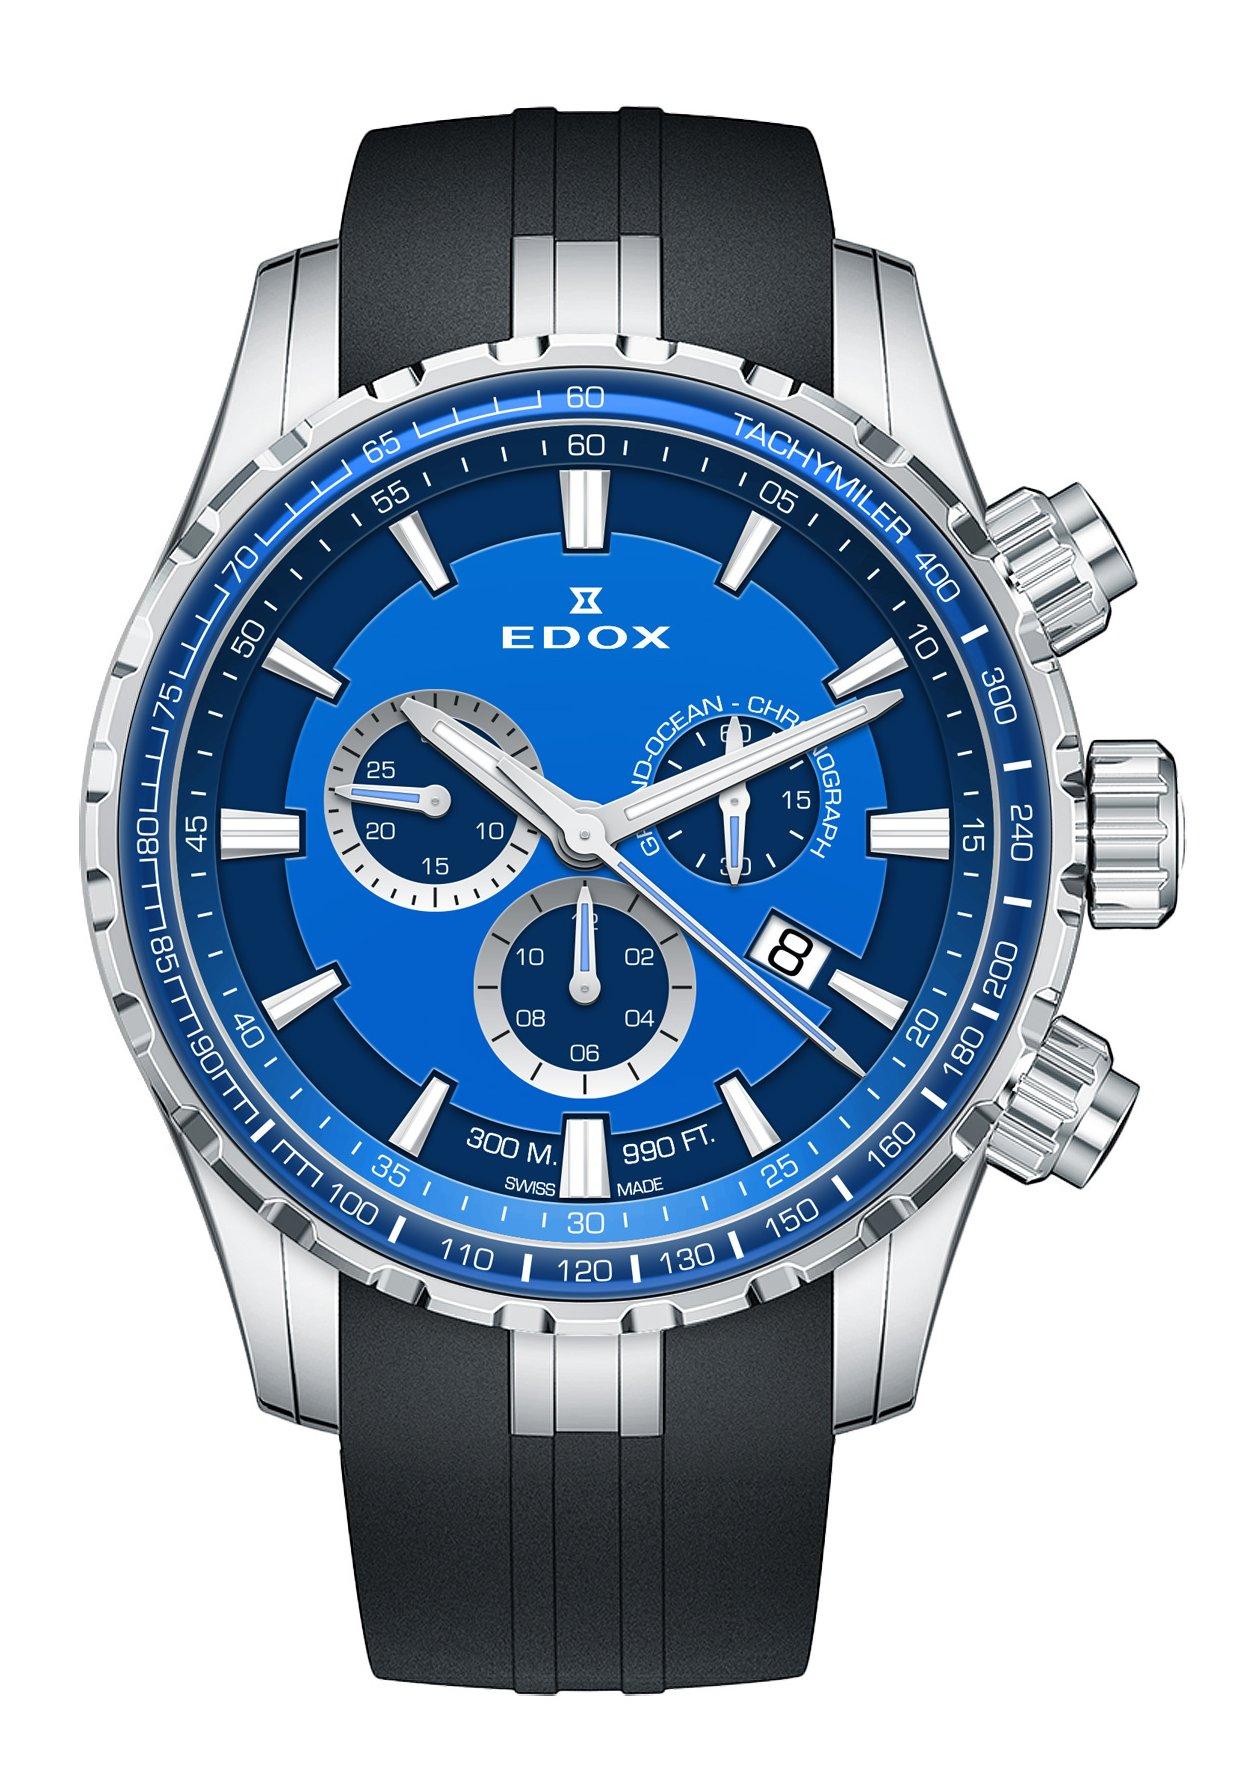 Часы edox гранд океан